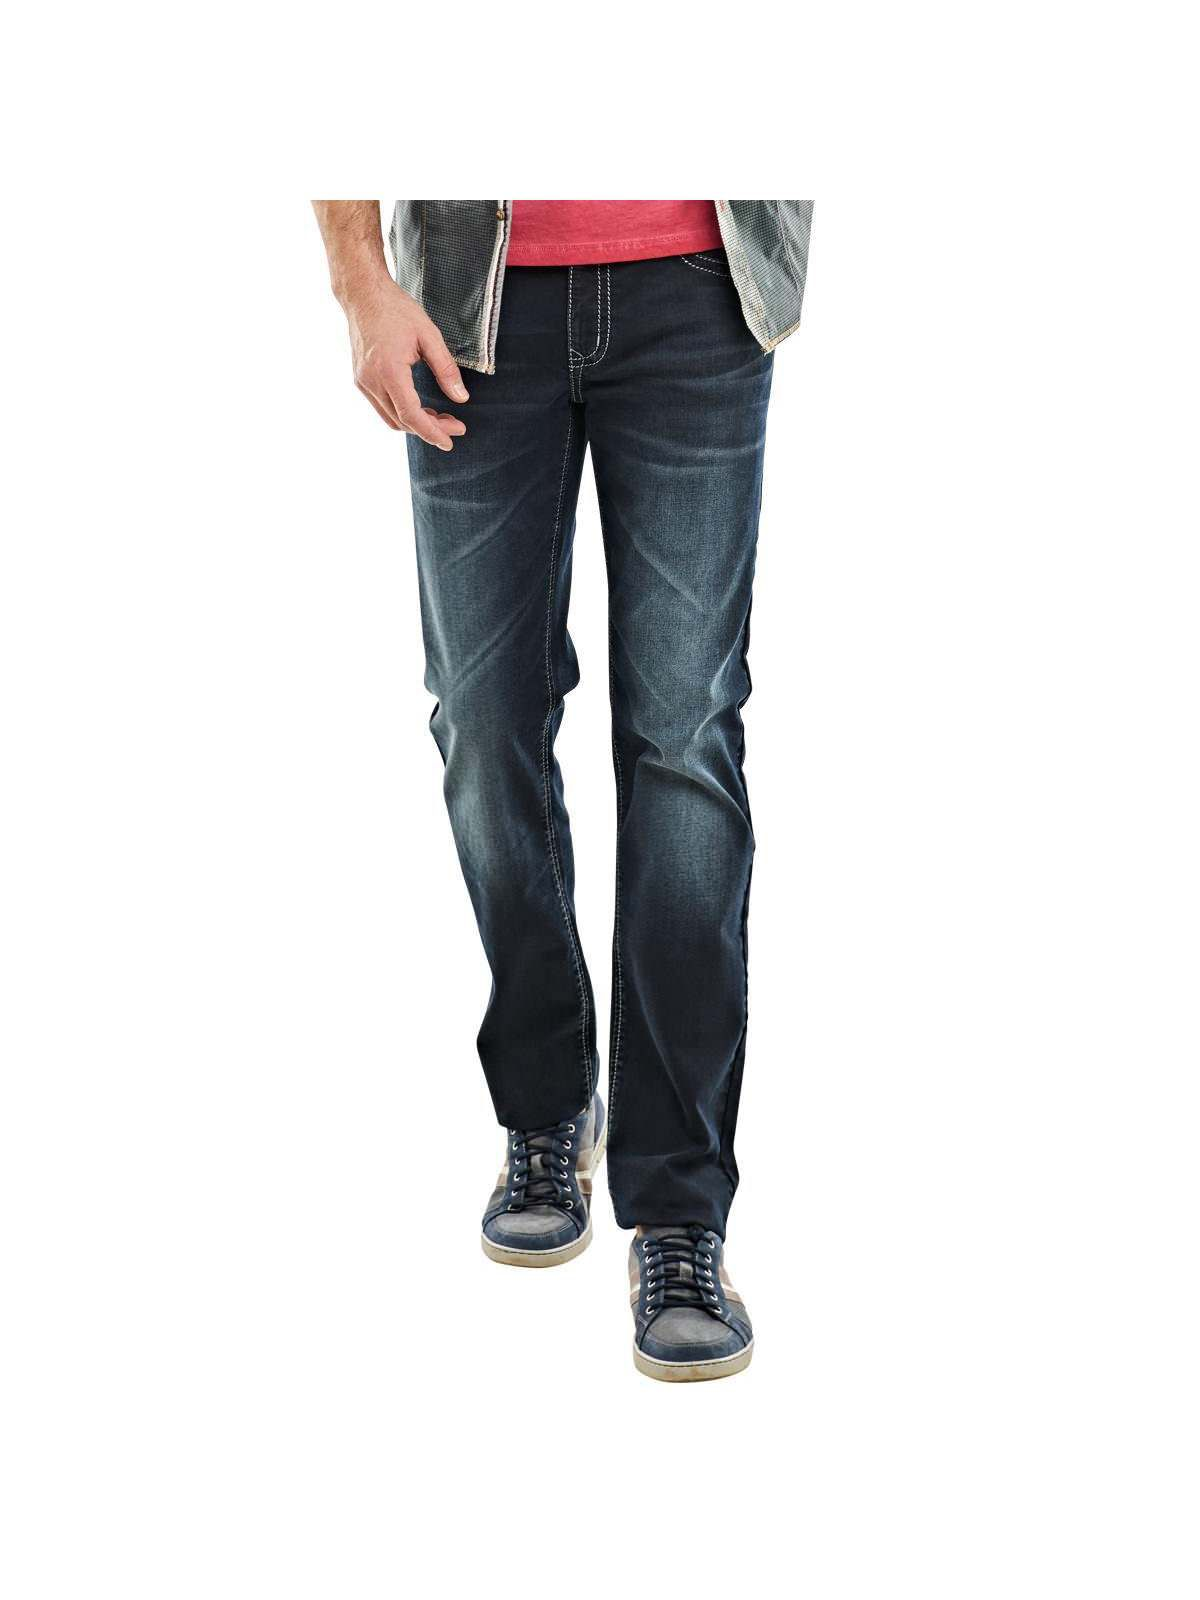 ENGBERS engbers Dark indigo Jeans